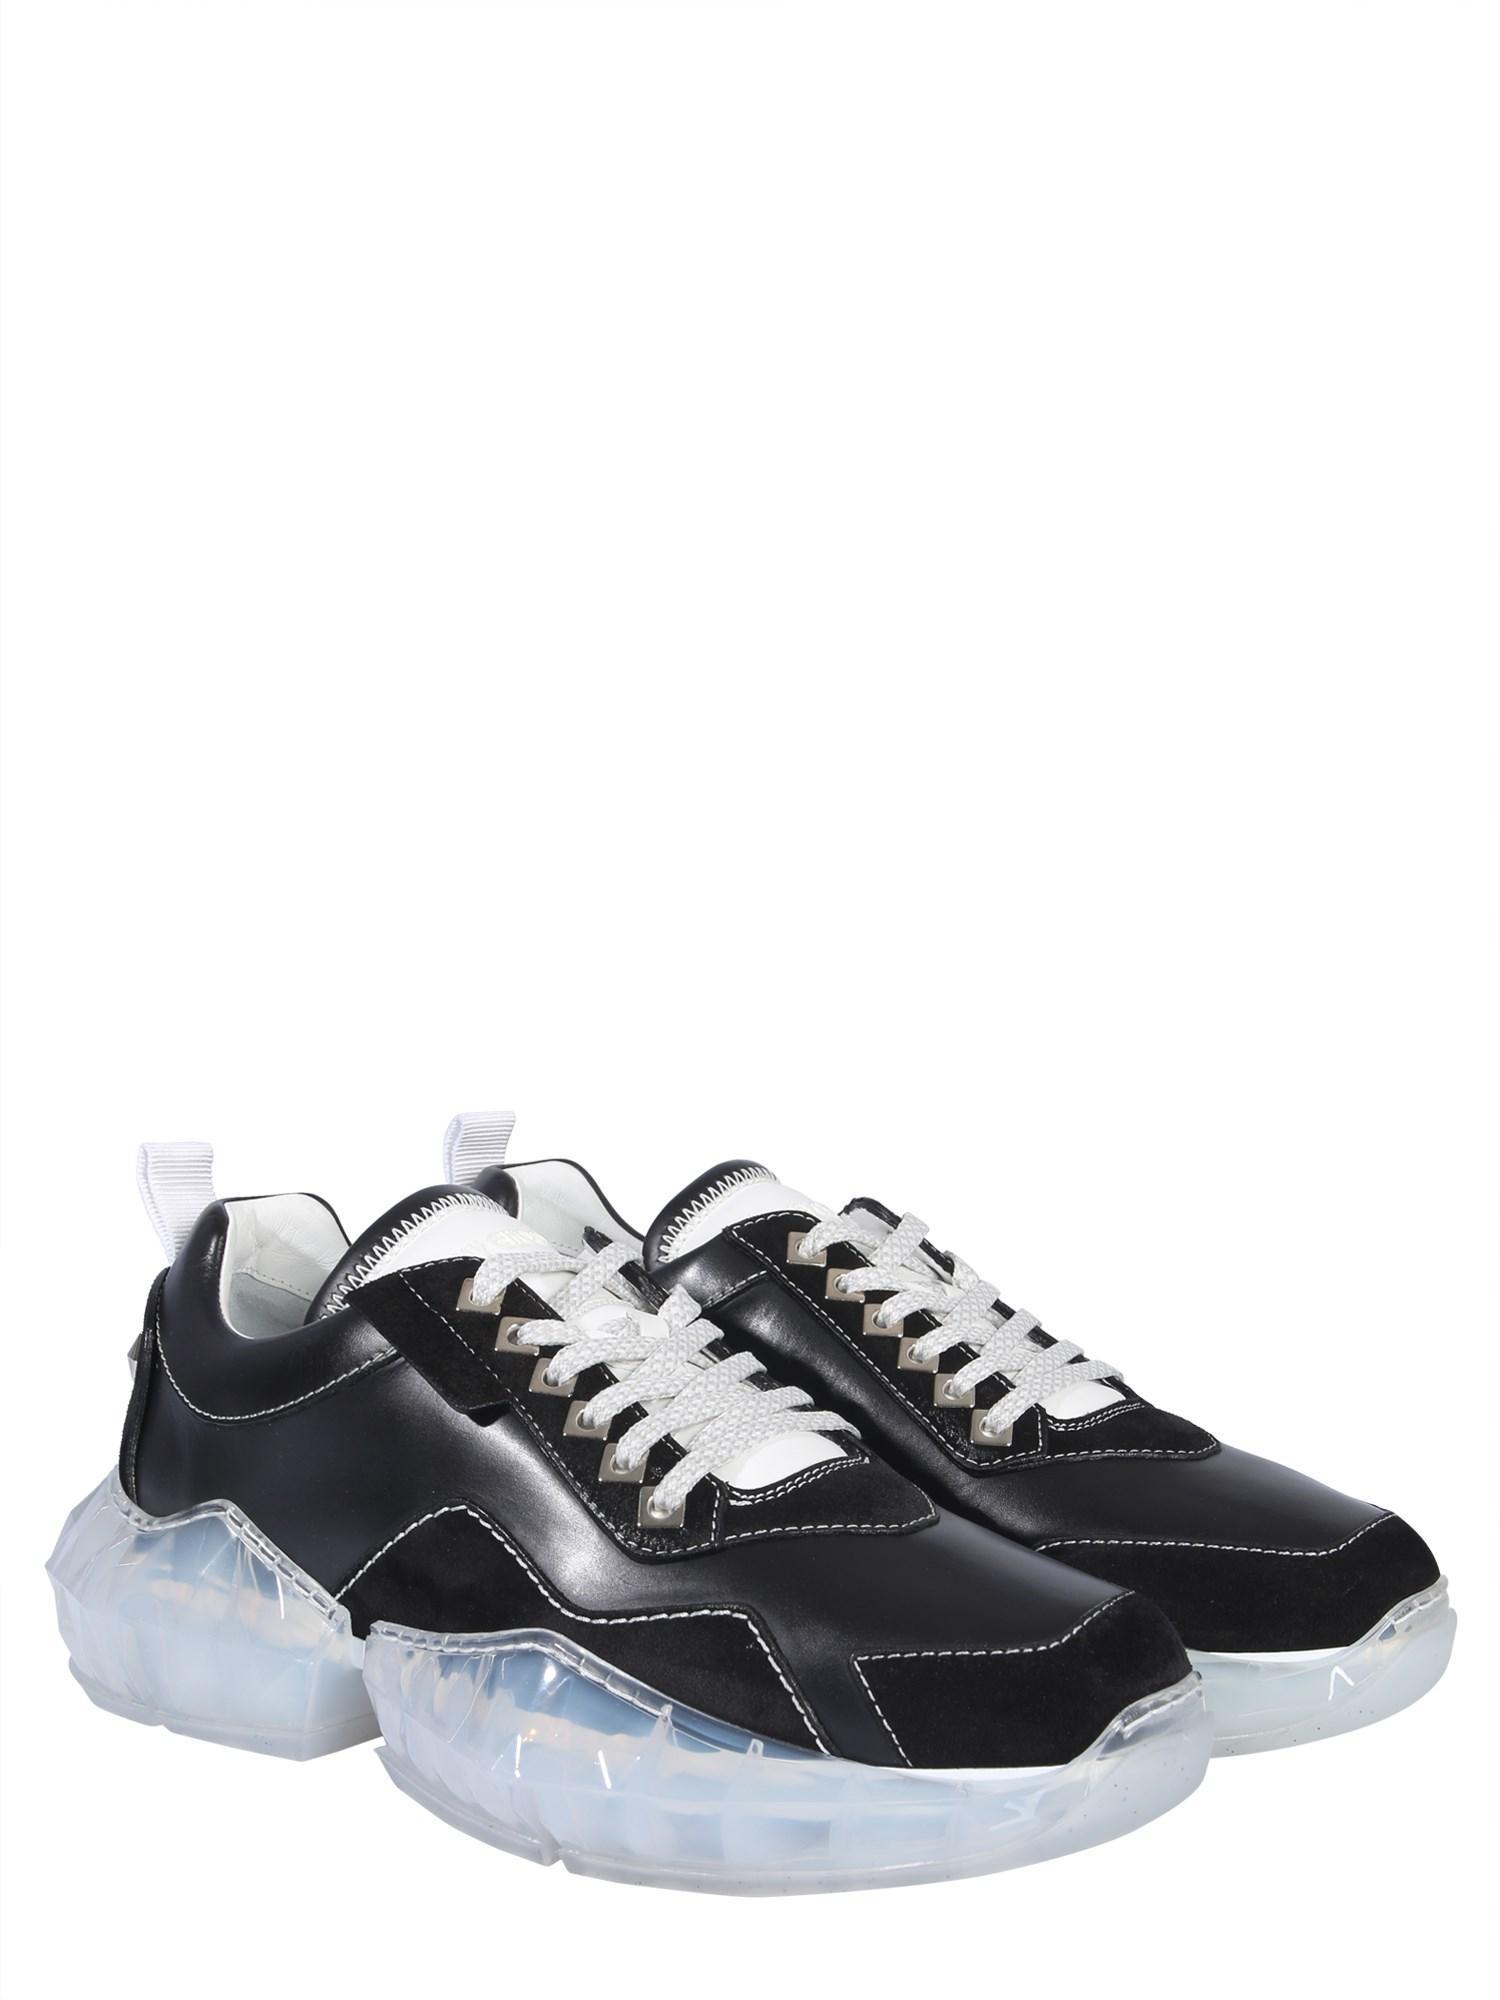 e9f13cdbda1 Jimmy Choo Sneaker Diamond In Pelle in Black for Men - Lyst